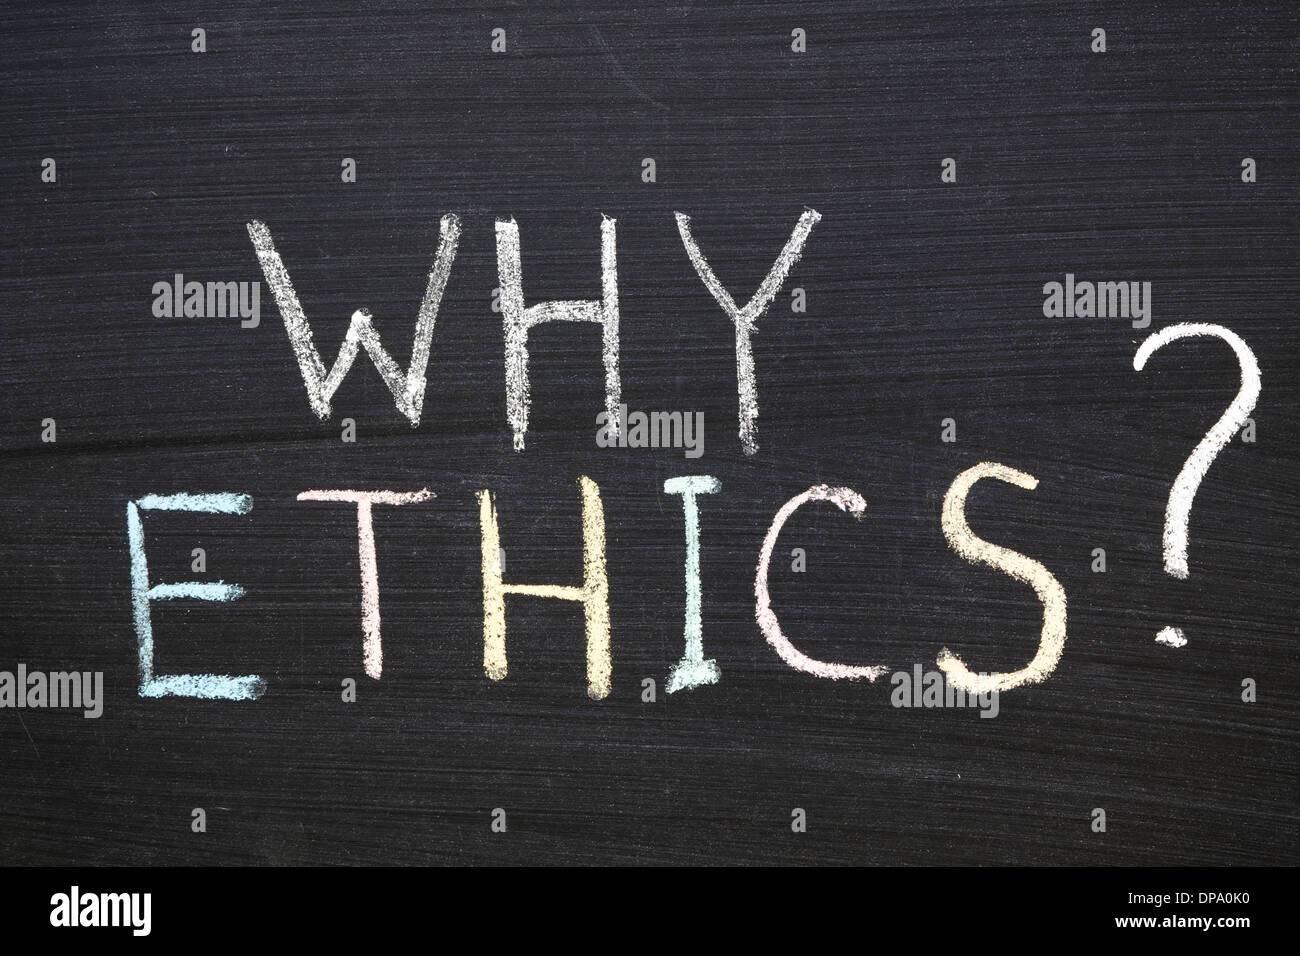 why ethics question handwritten on the school blackboard - Stock Image